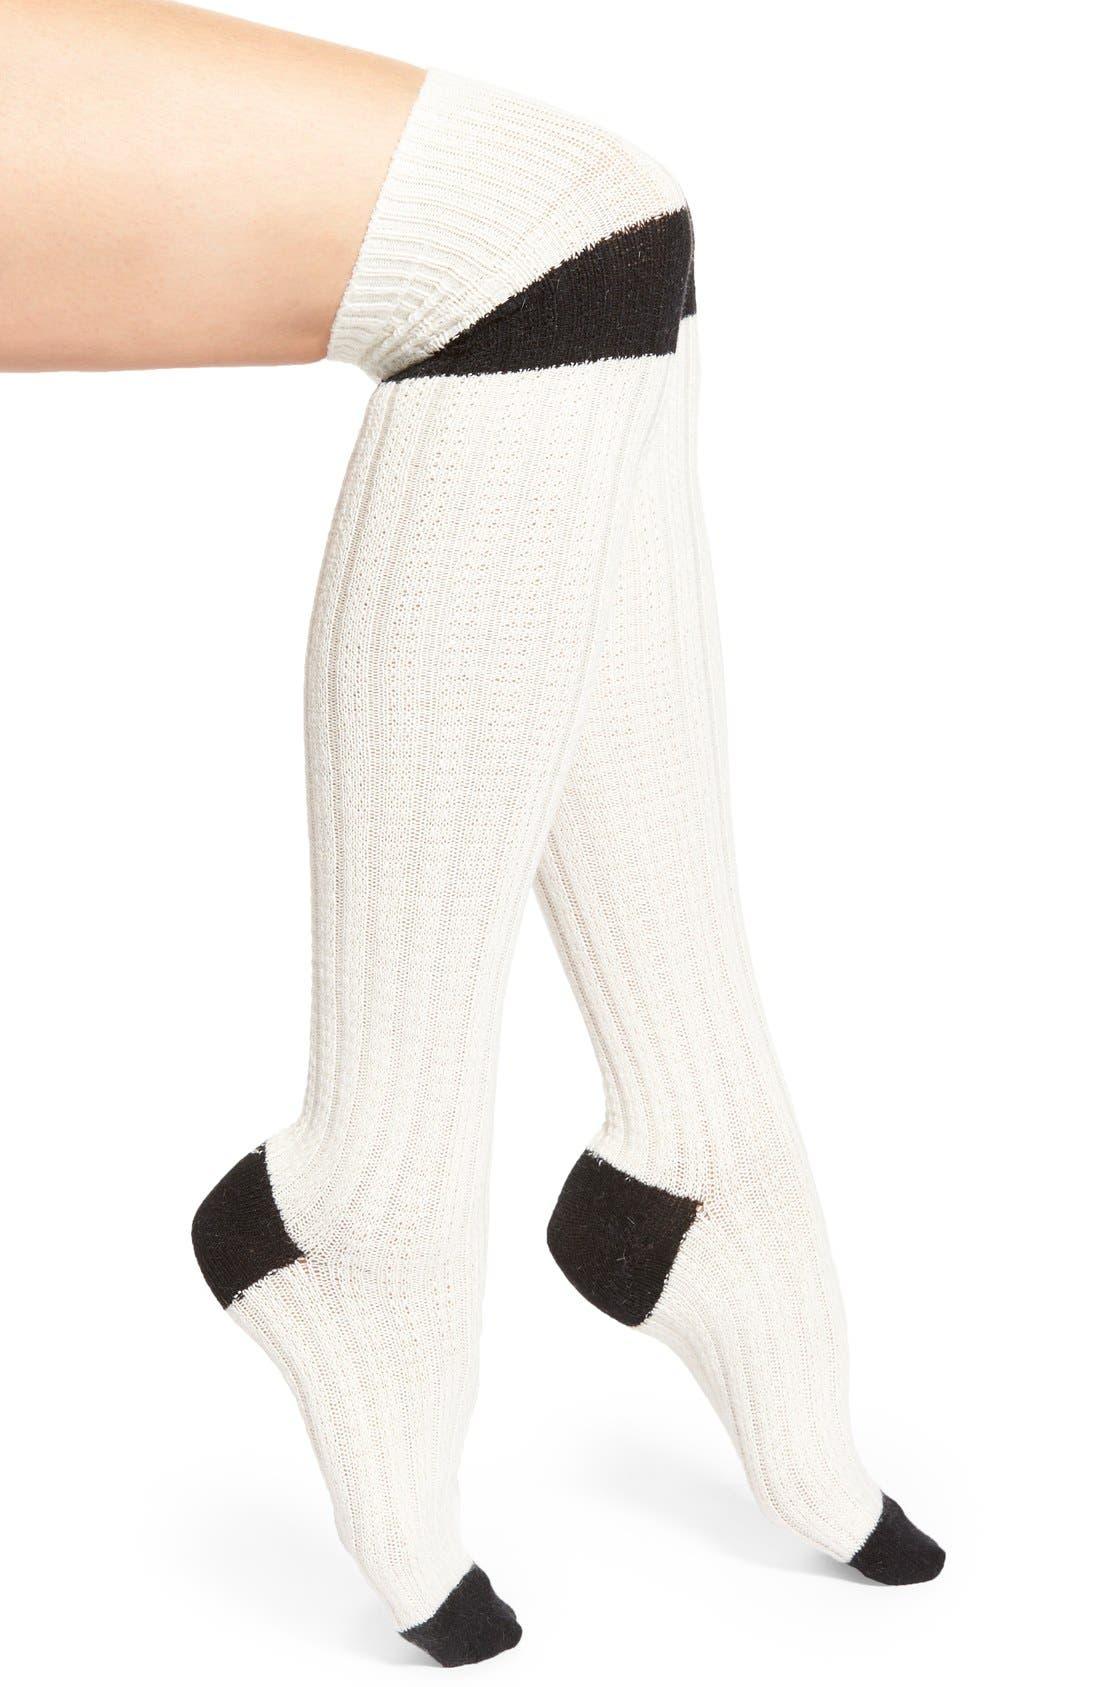 Main Image - Stance 'Gemini' Over the Knee Socks